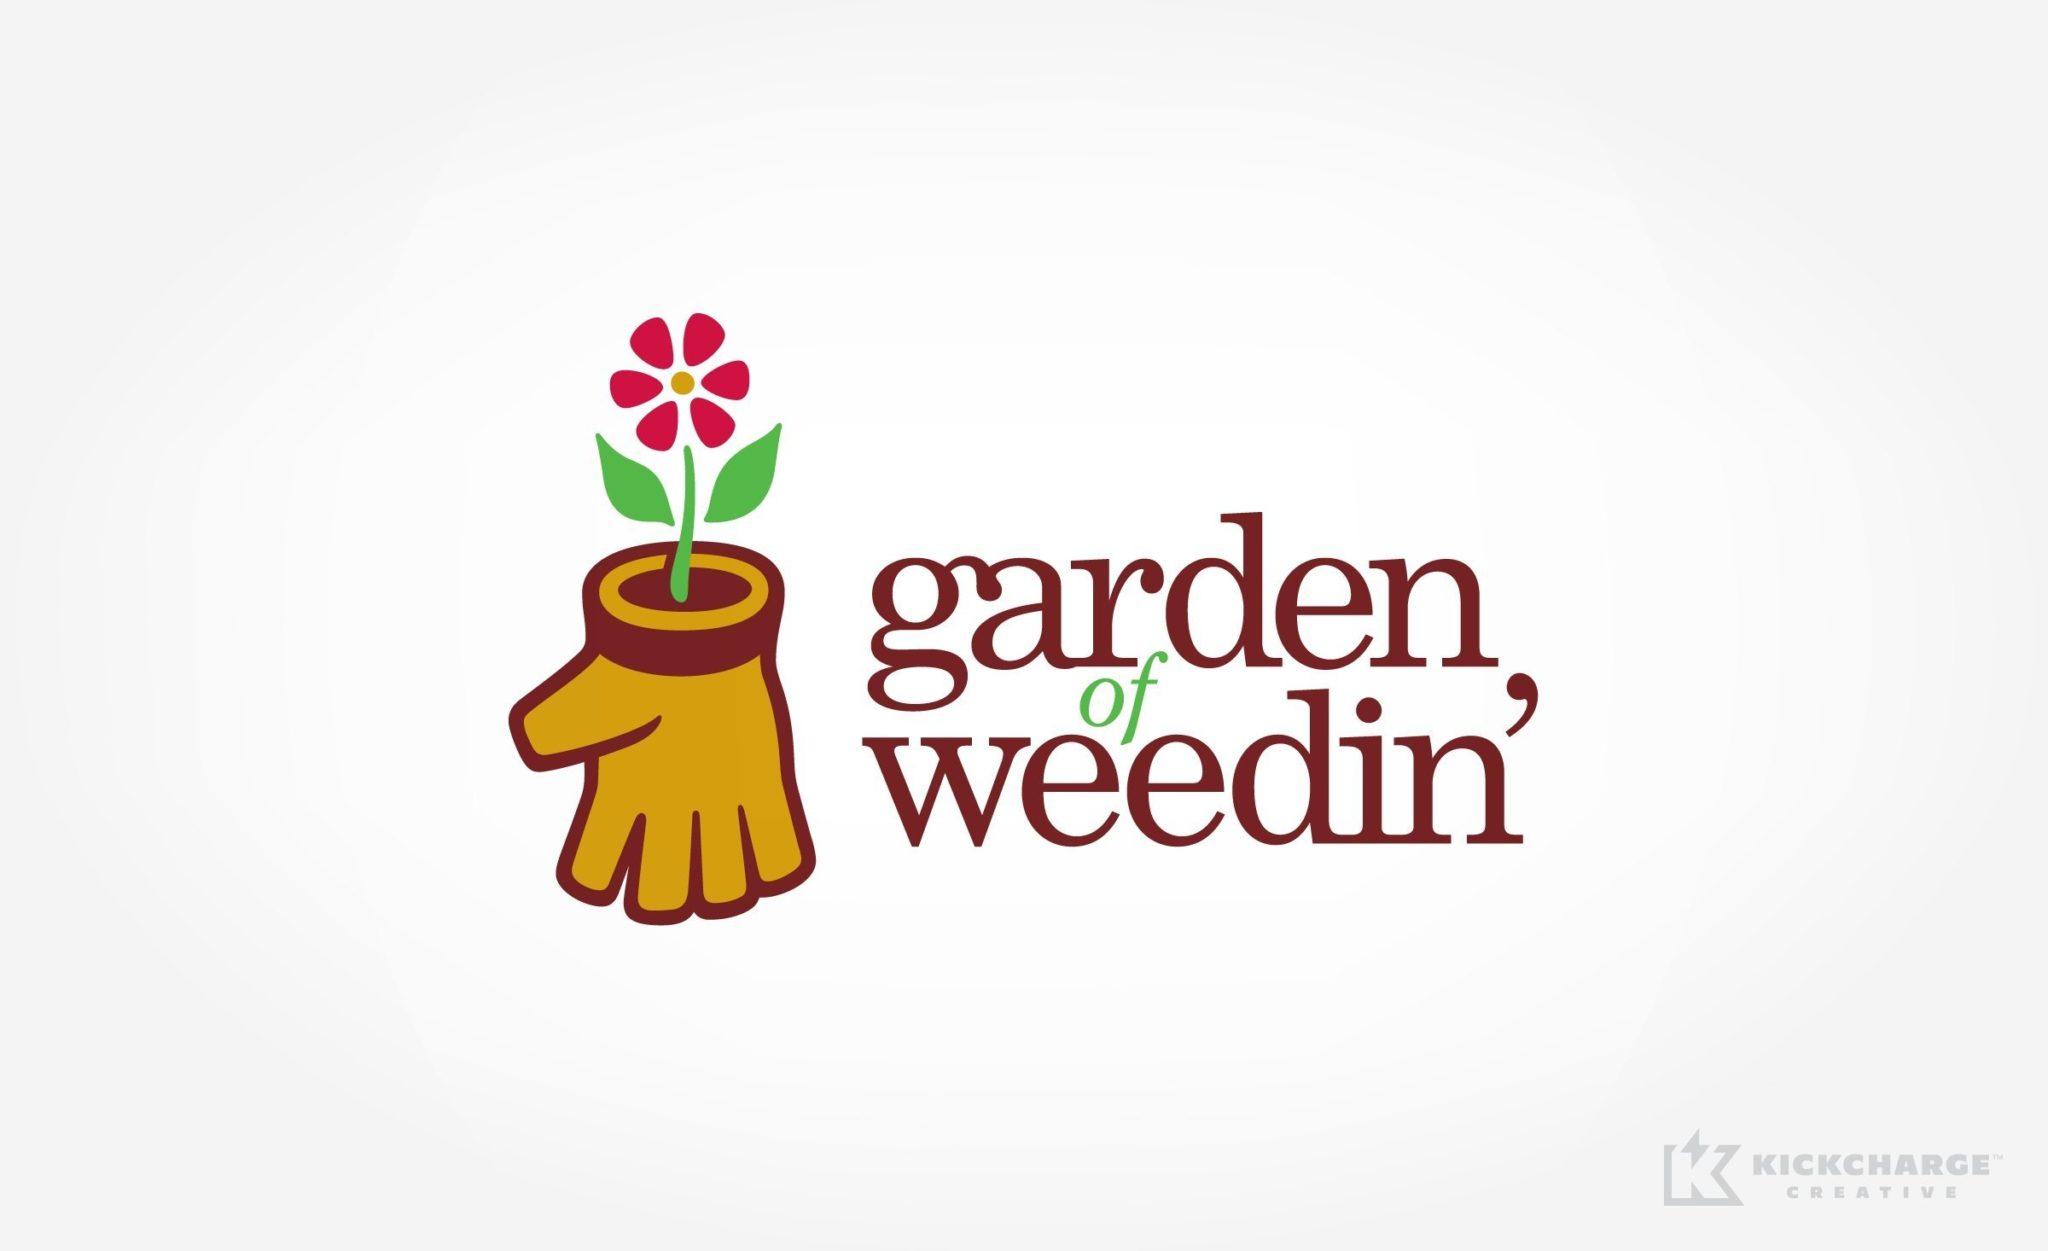 garden of weedin kickcharge creative